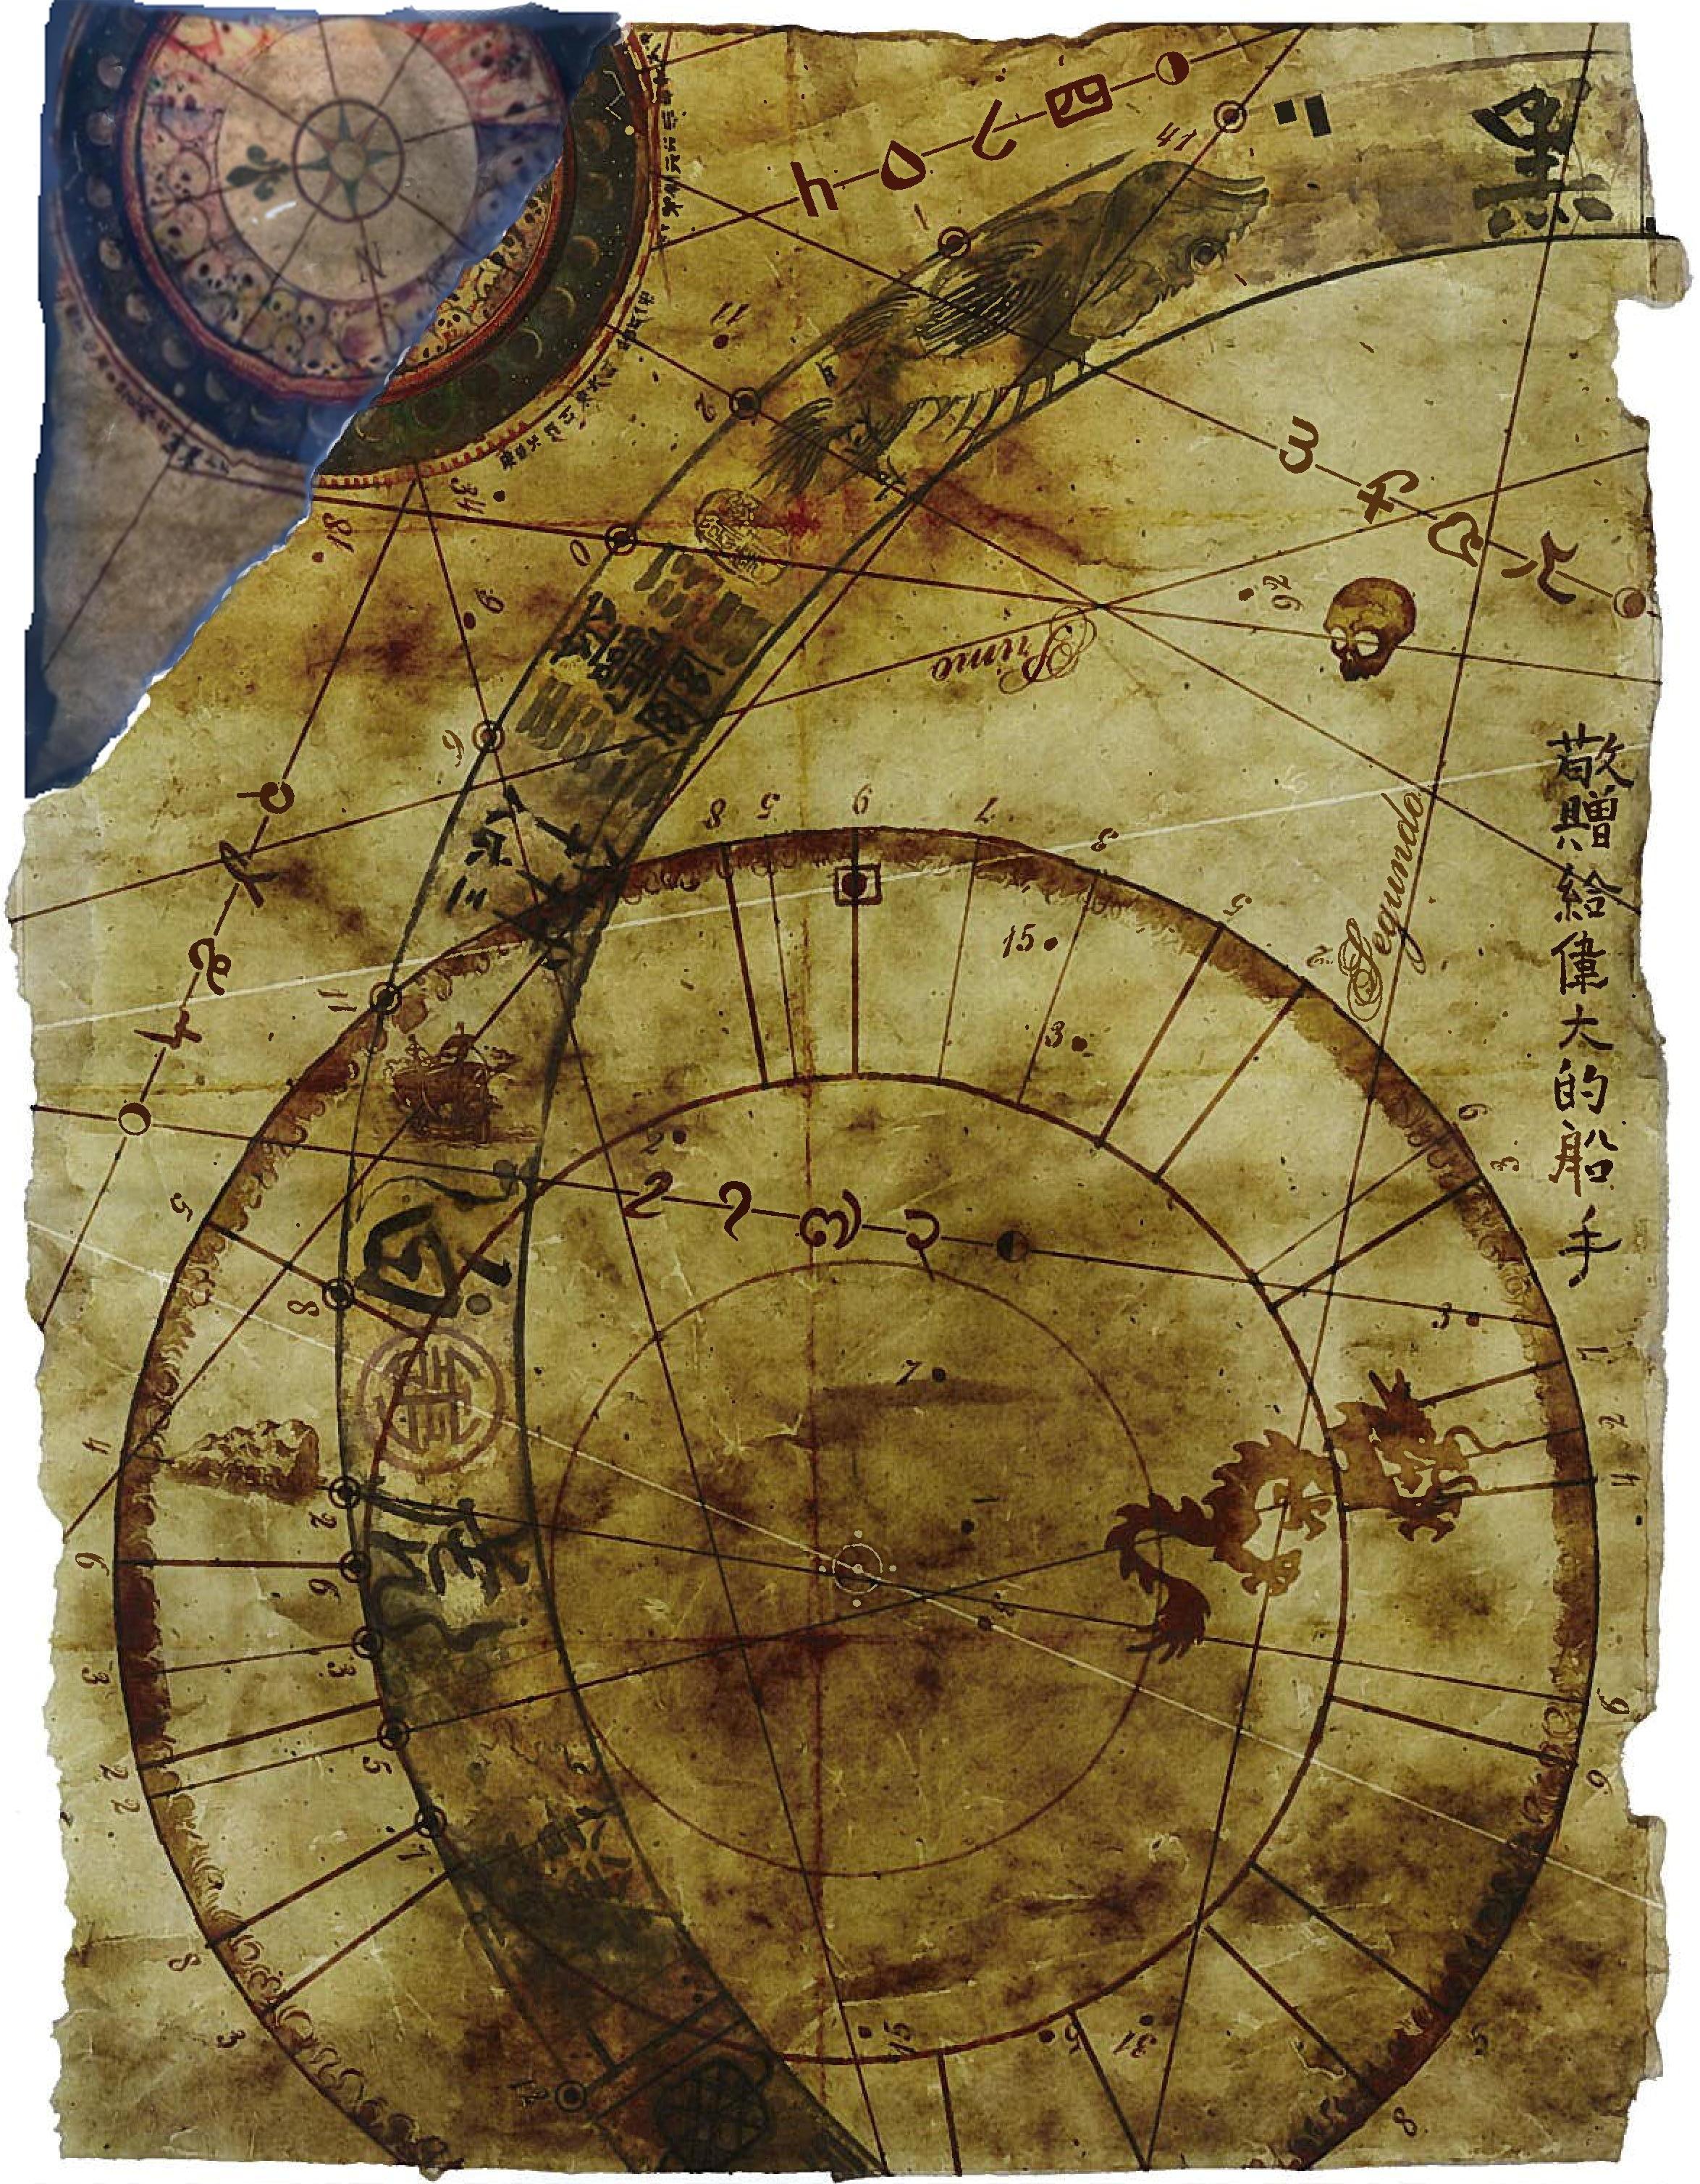 Old parchment map.